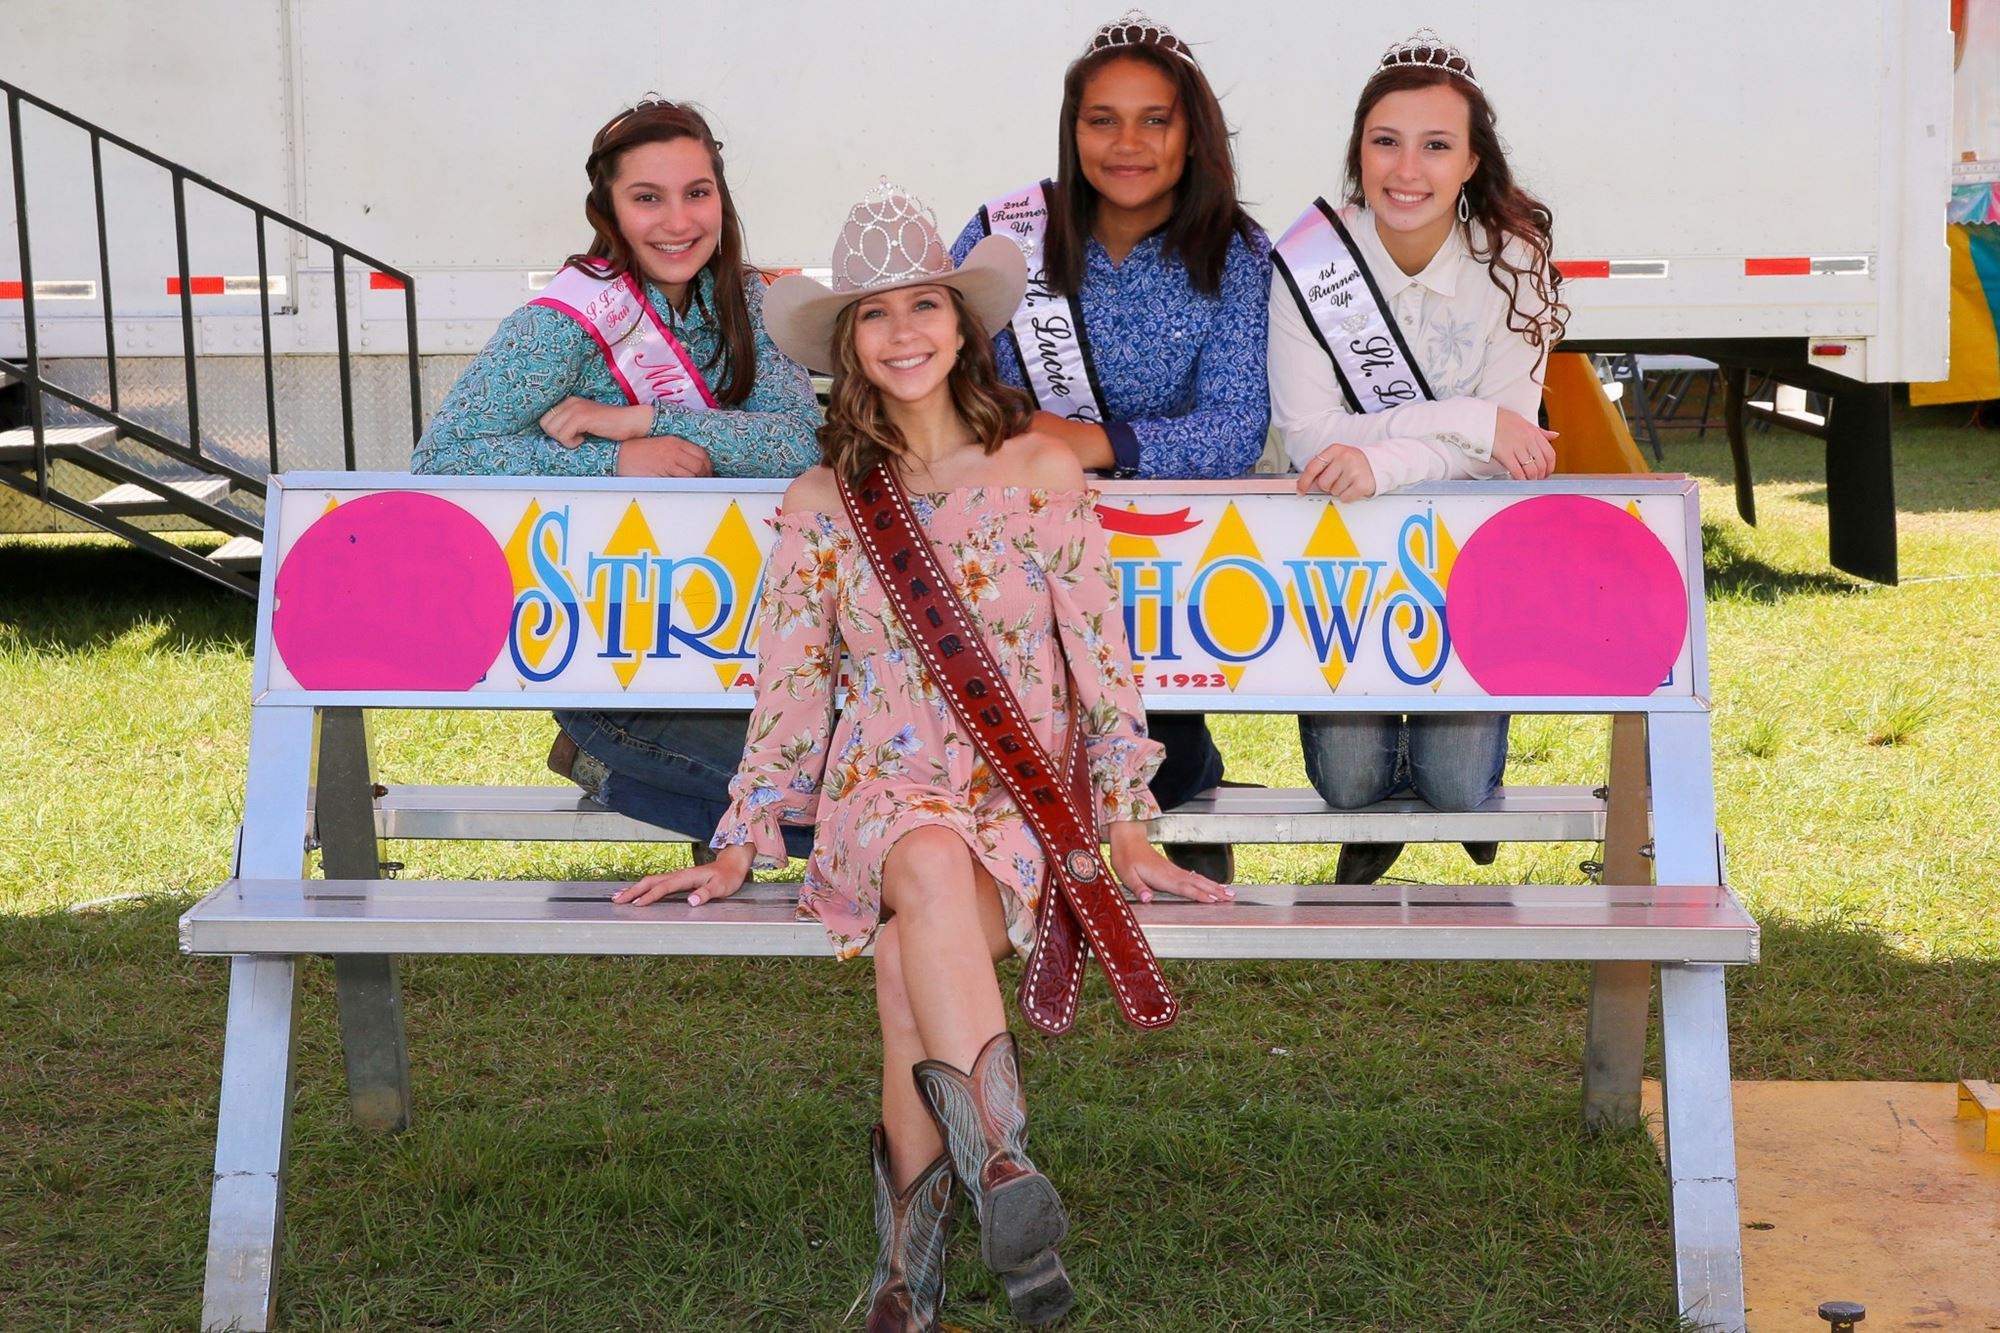 Fair Queen Pertaining To Saint Lucie County School Calendar 2021